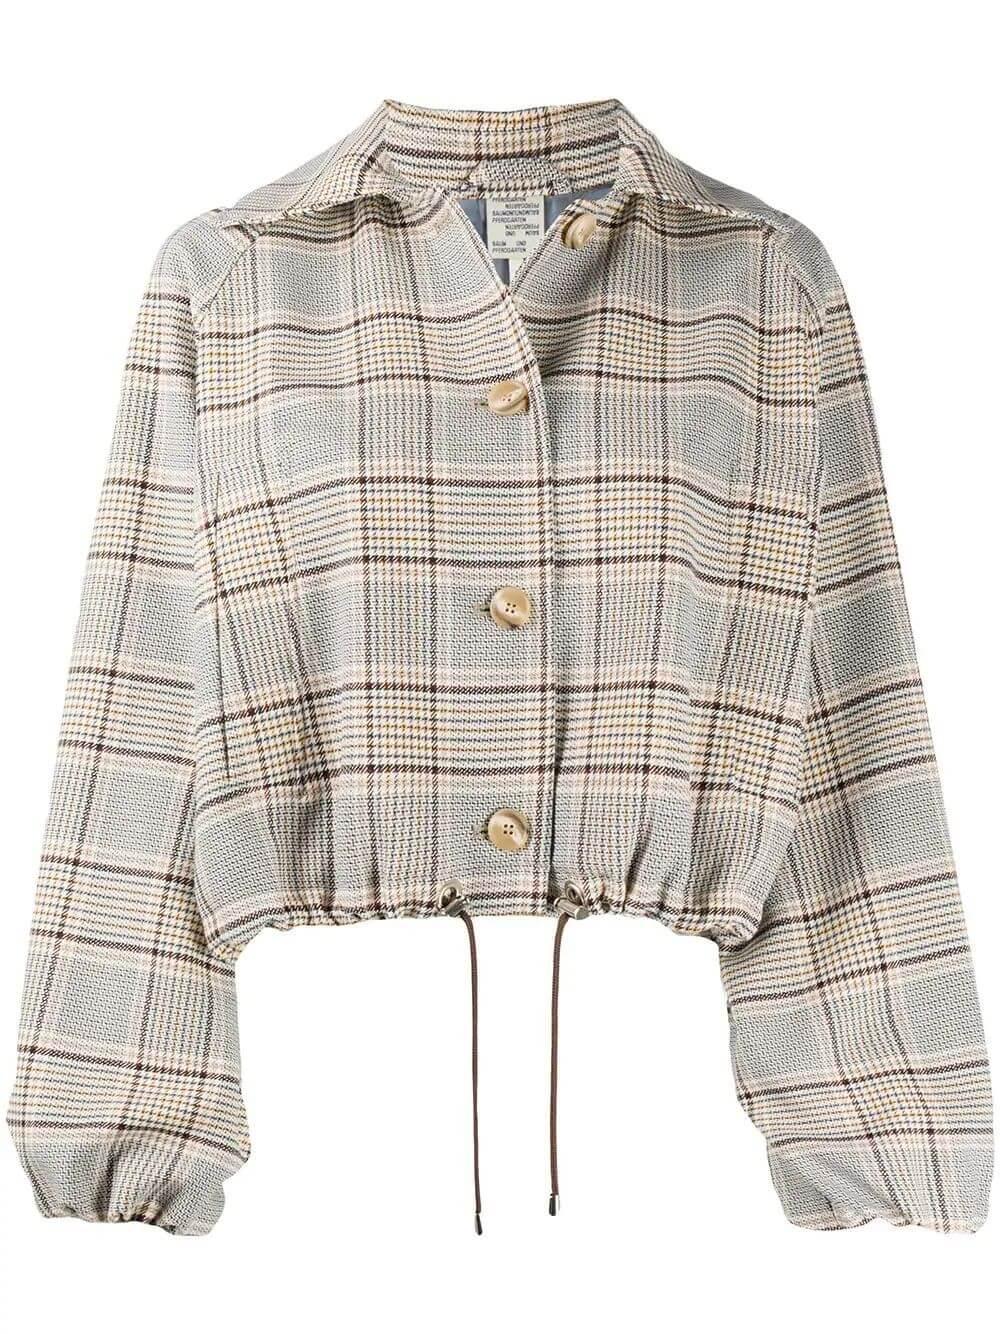 Blair Plaid Jacket Item # 20978